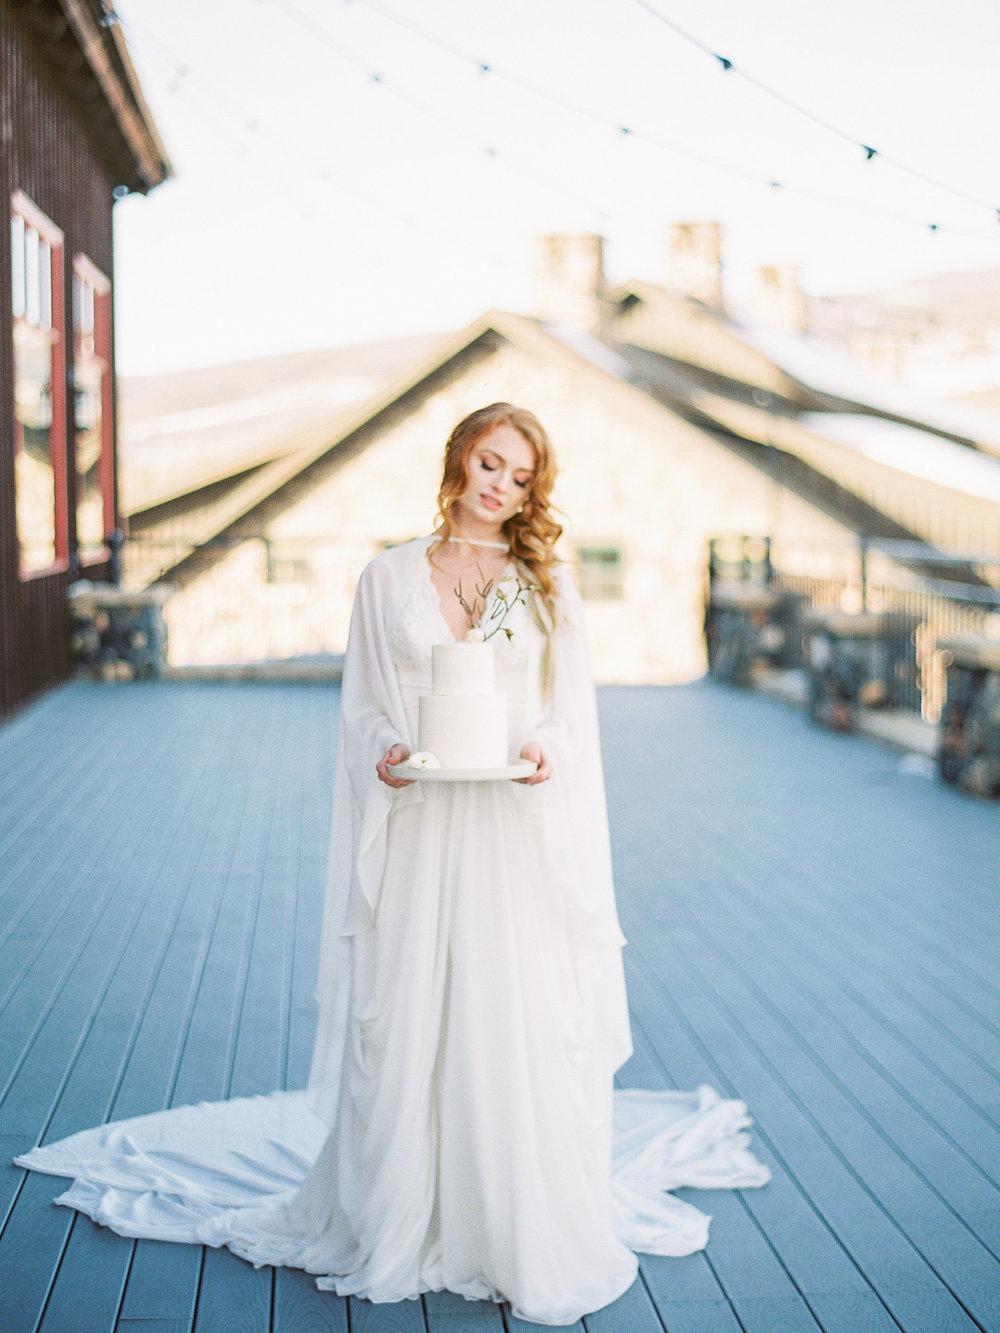 Dani-Cowan-Photography-Devils-Thumb-Ranch-Winter-Luxury-Wedding136.jpg